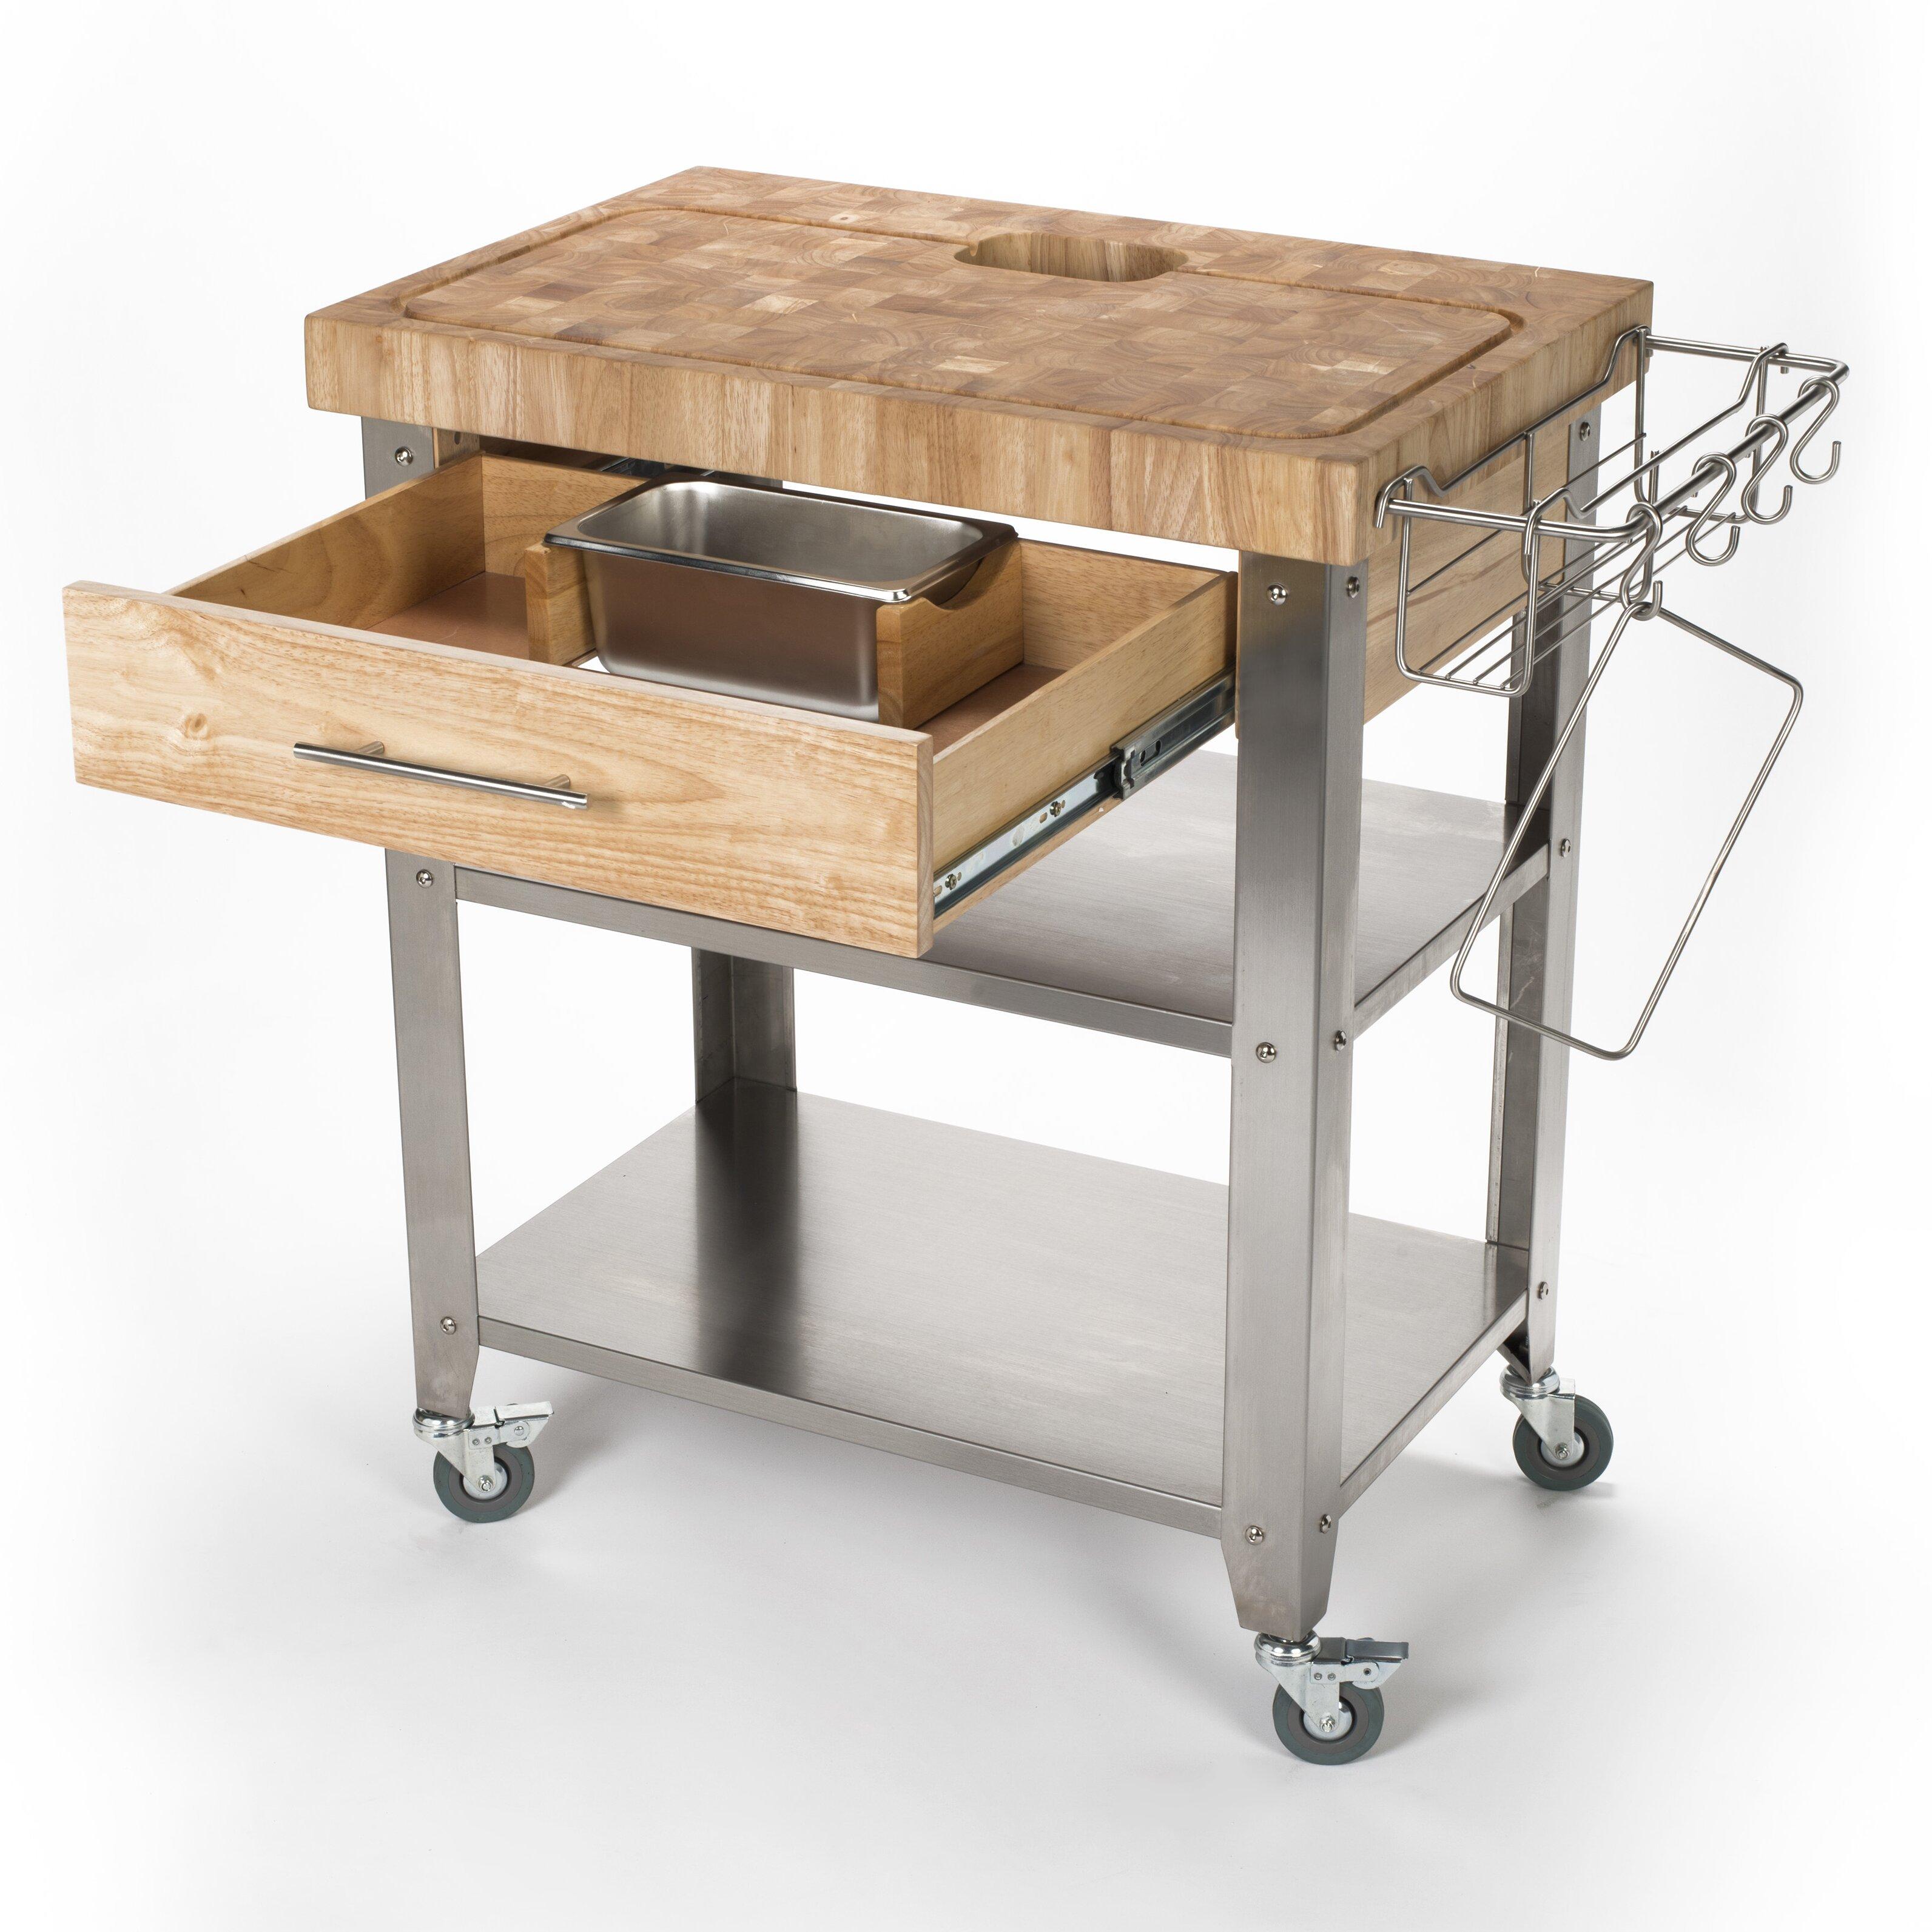 Kitchen Butcher Blocks : Chris & Chris Pro Stadium Kitchen Cart with Butcher Block Top & Reviews Wayfair